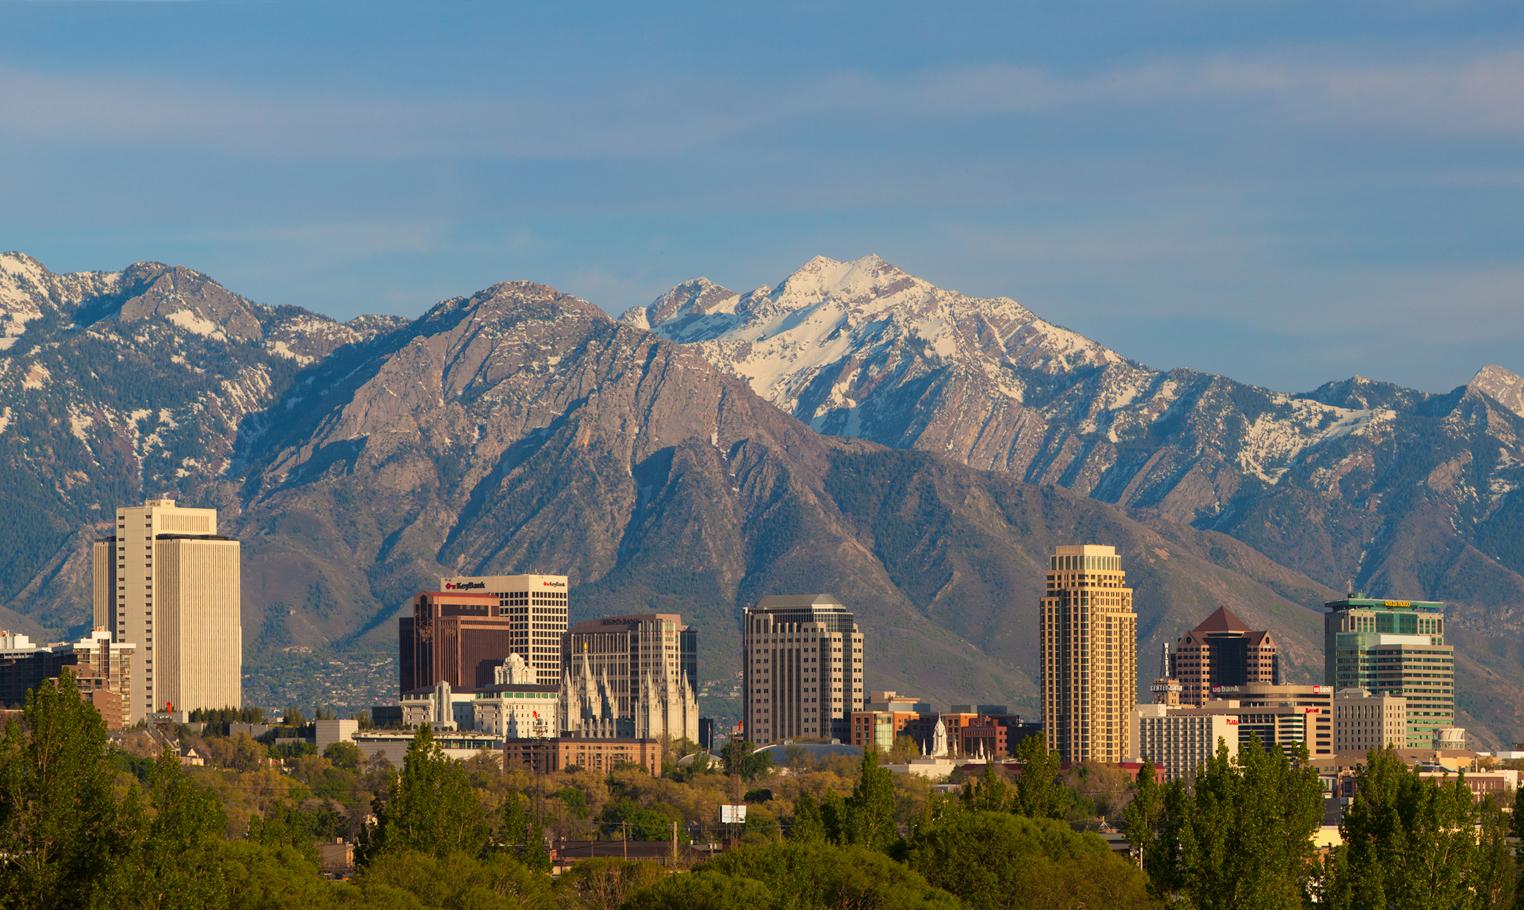 Free download Utah Credit Union Deseret